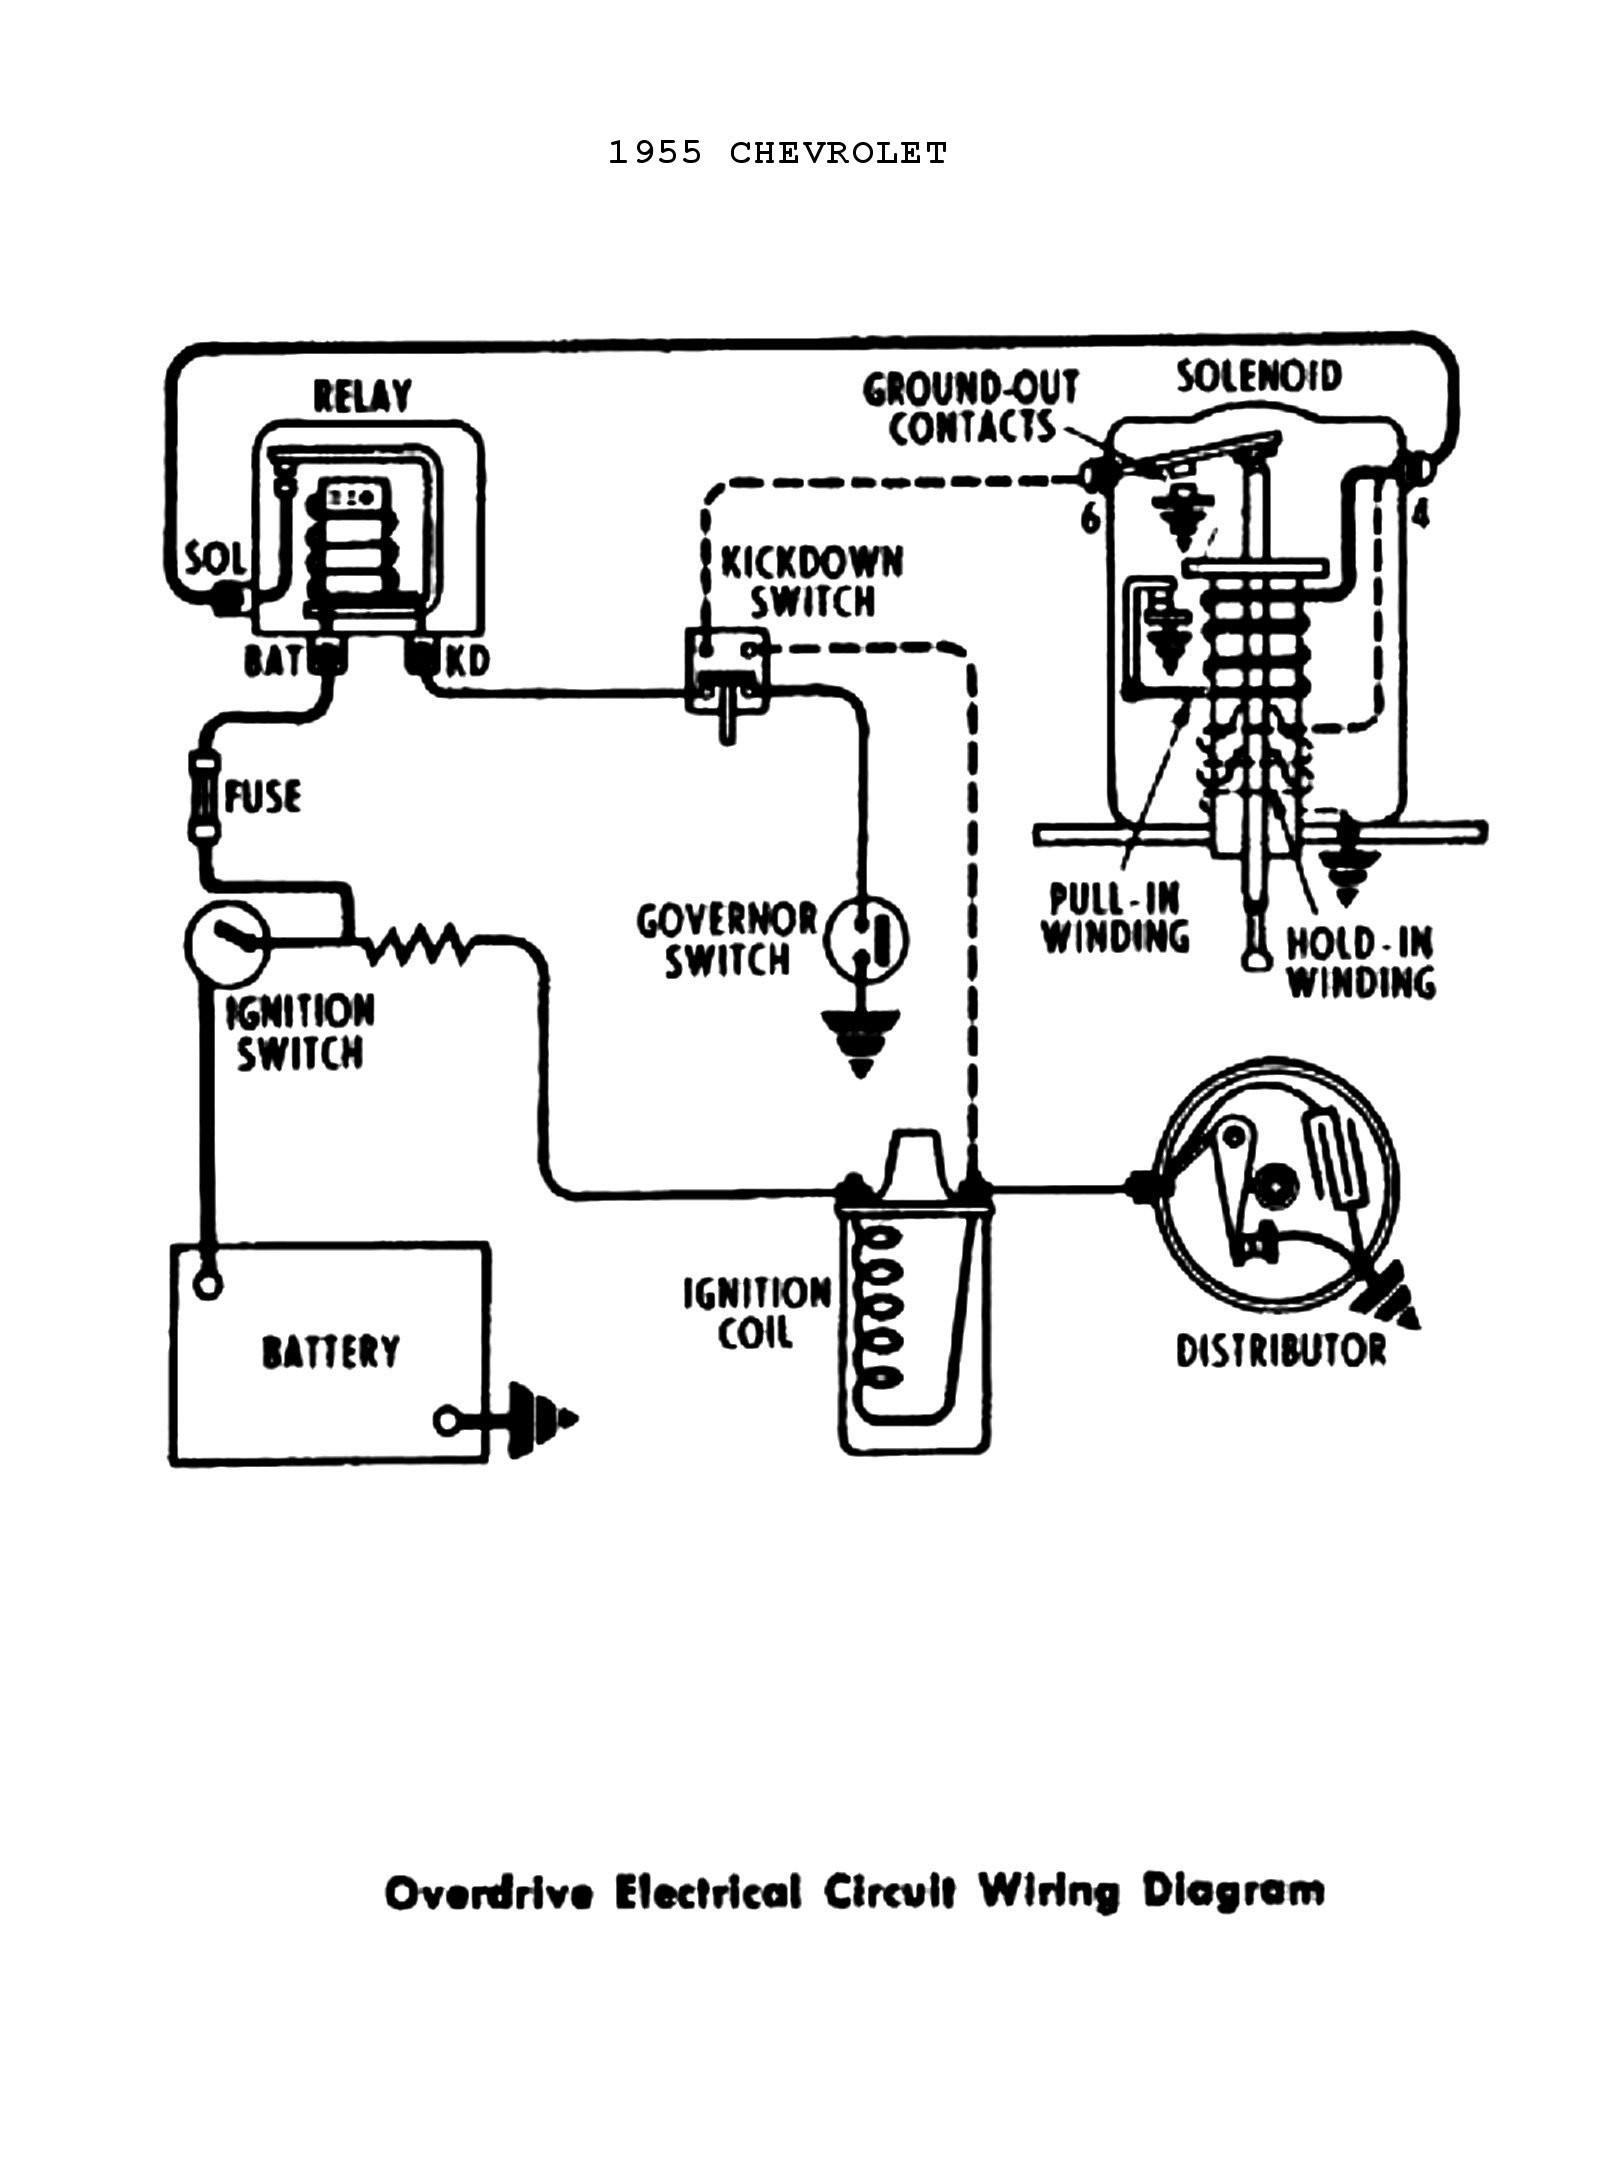 78 Chevy Truck Wiring Diagram Wrg 9424] Wiring Diagram 78 Chevy Truck Of 78 Chevy Truck Wiring Diagram